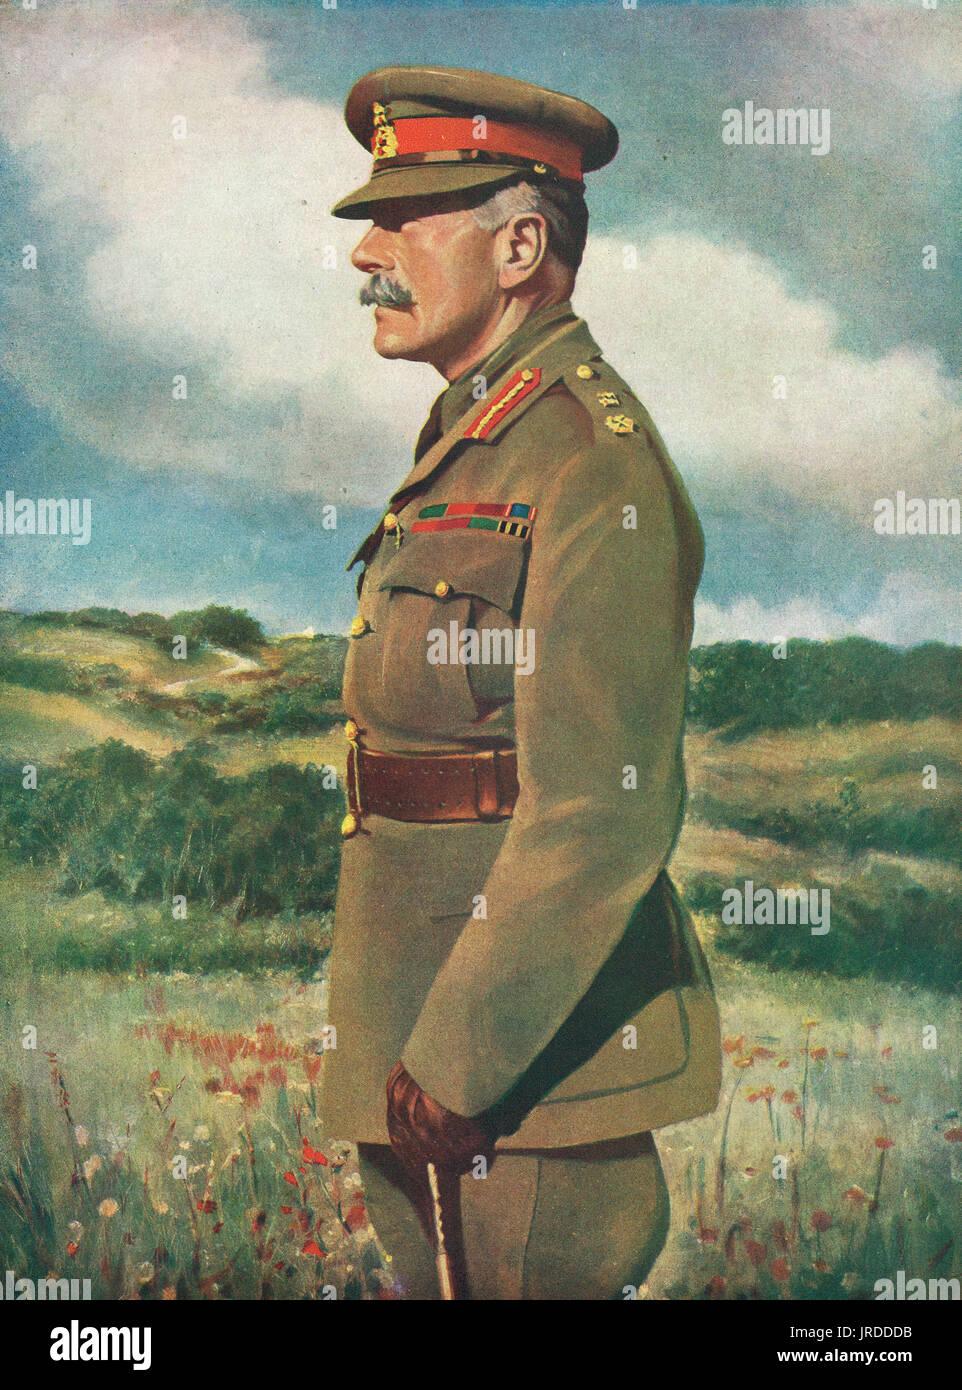 Field Marshal Sir Douglas Haig - Stock Image